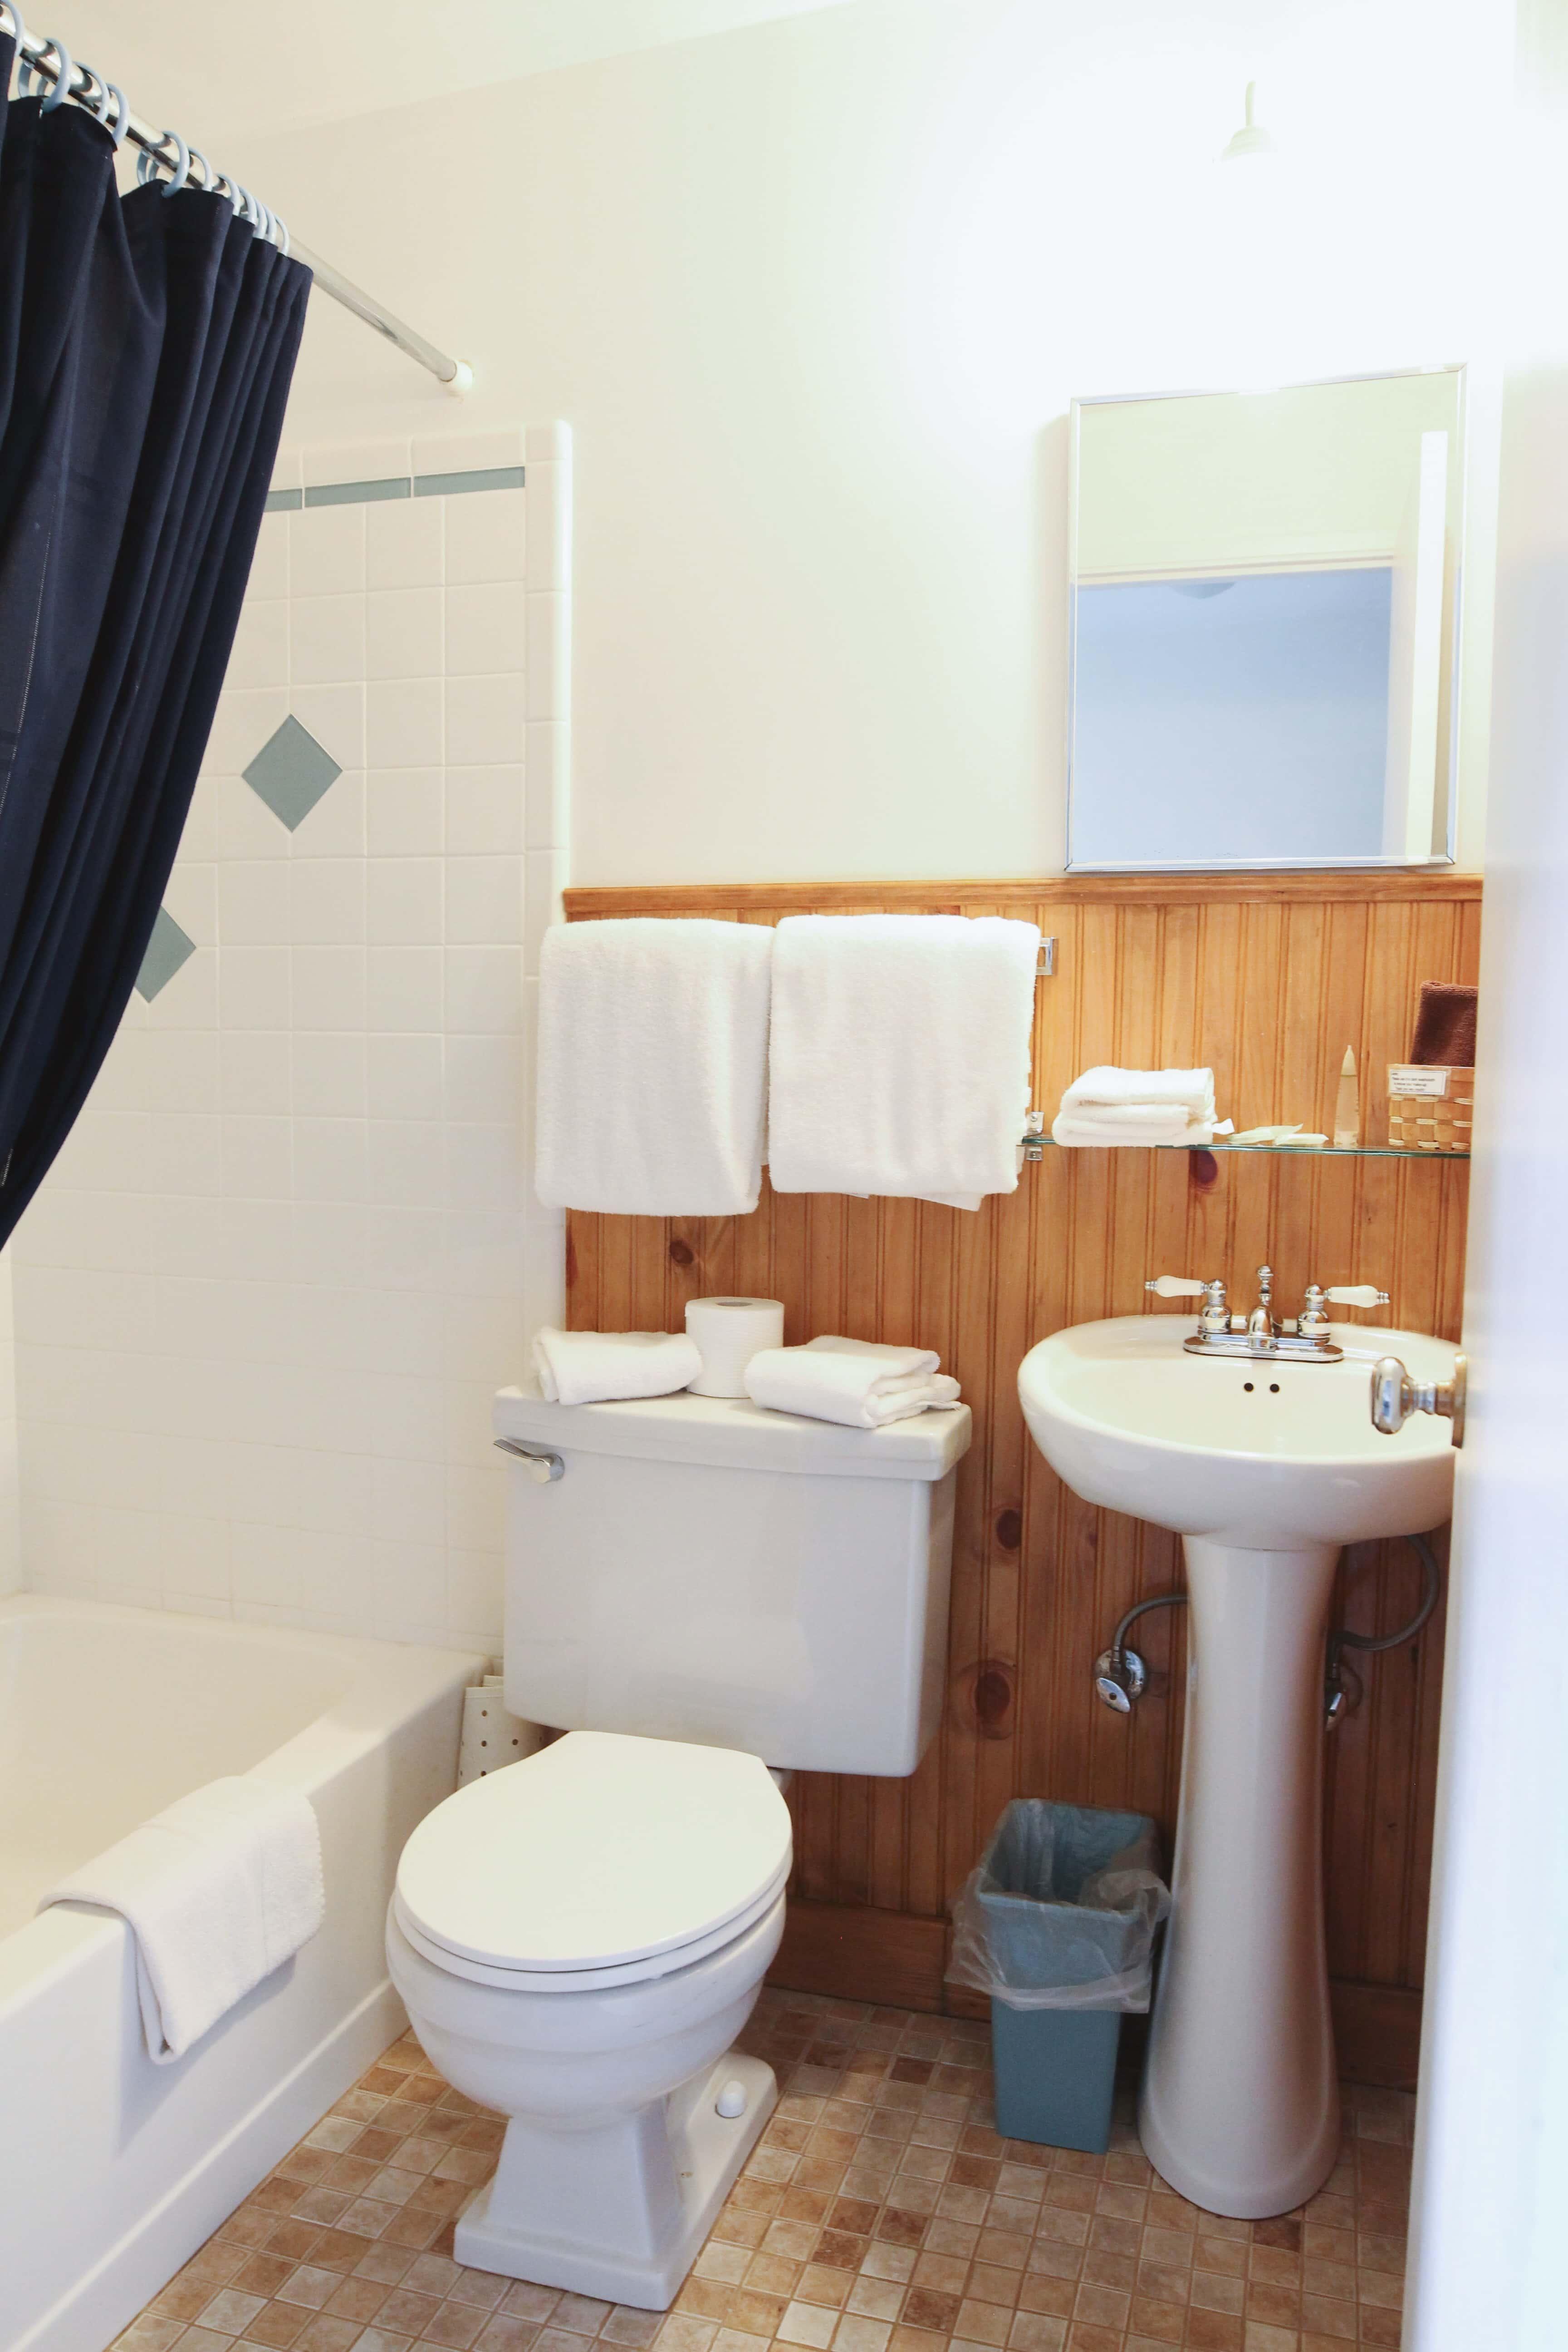 Emerald Valley Inn - Fir Room Bathroom